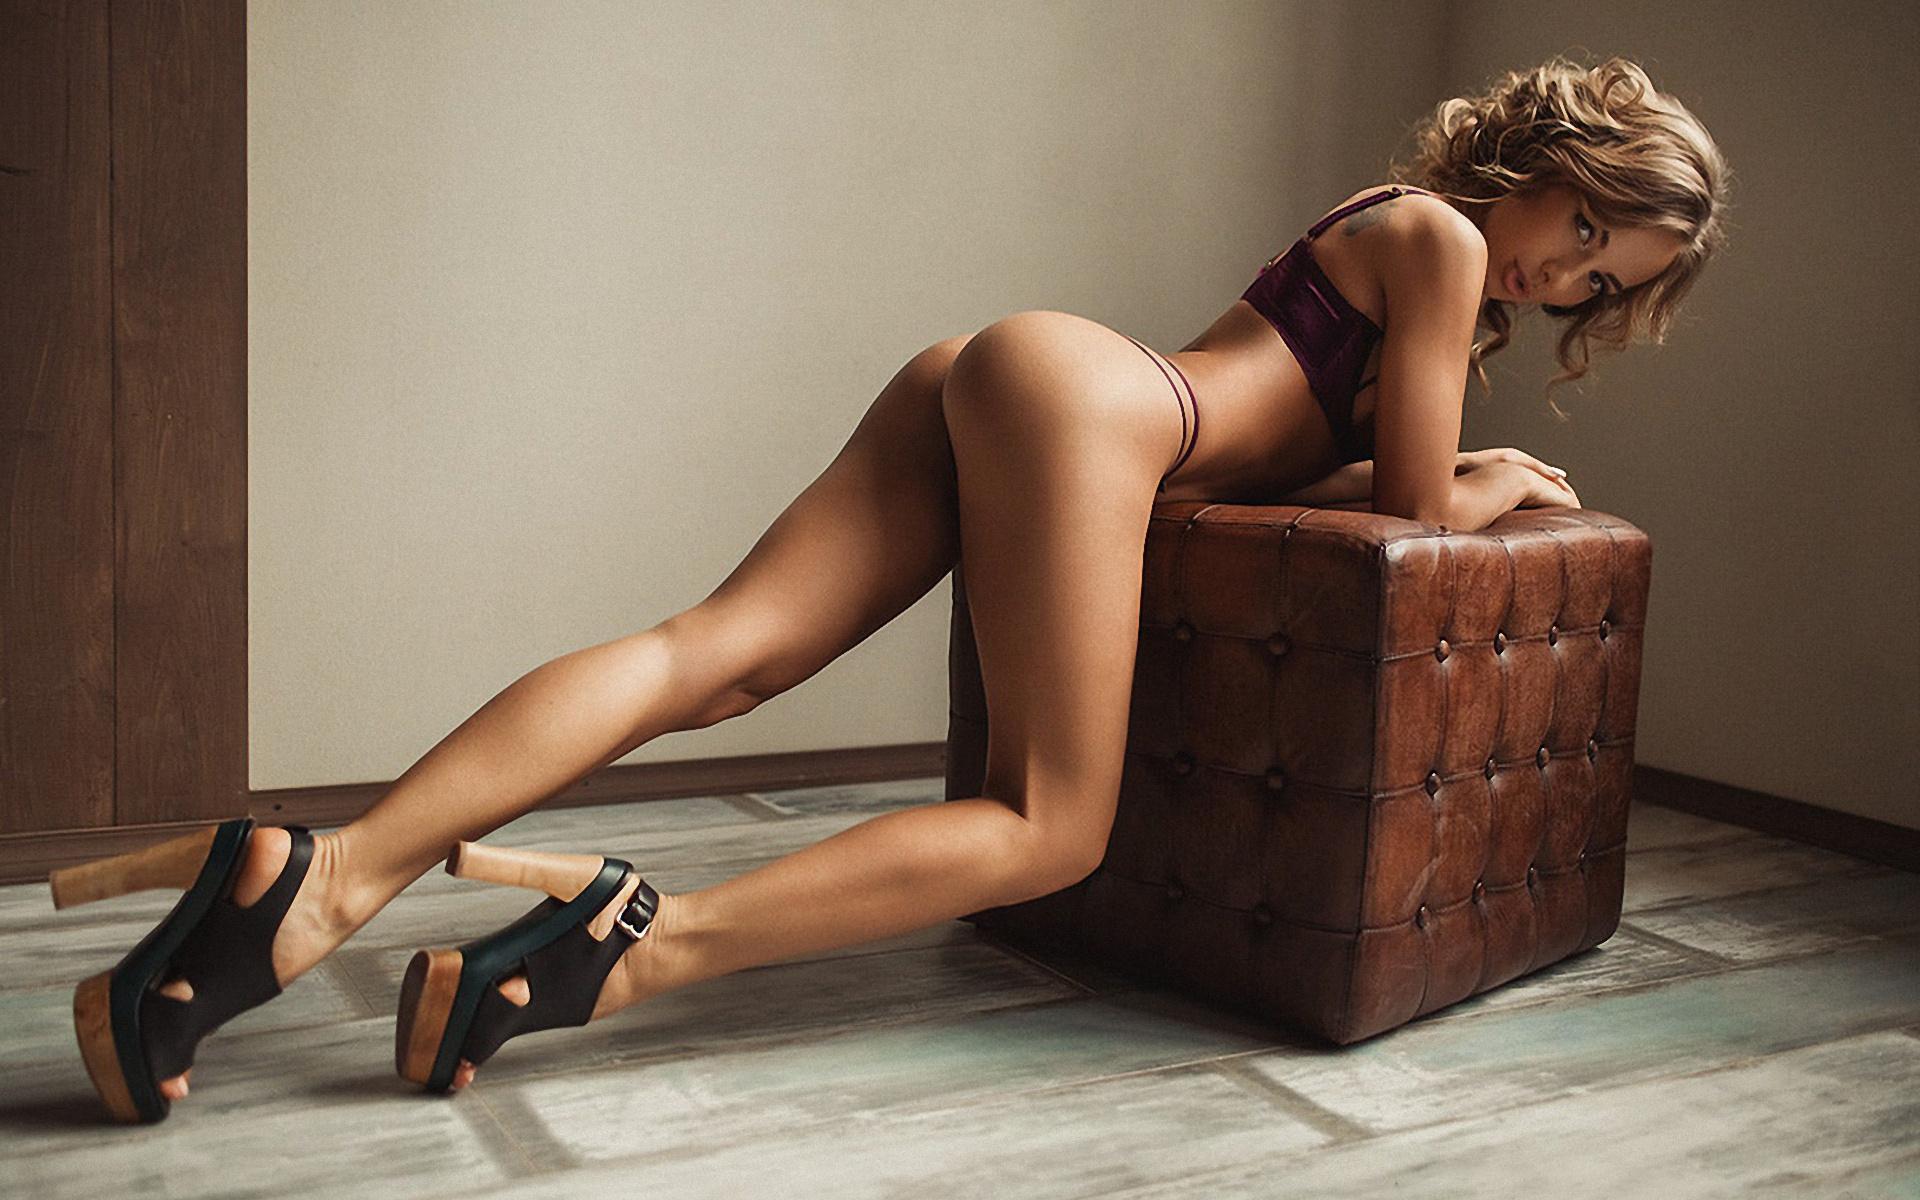 Handsome Naked Women Wearing High Heels